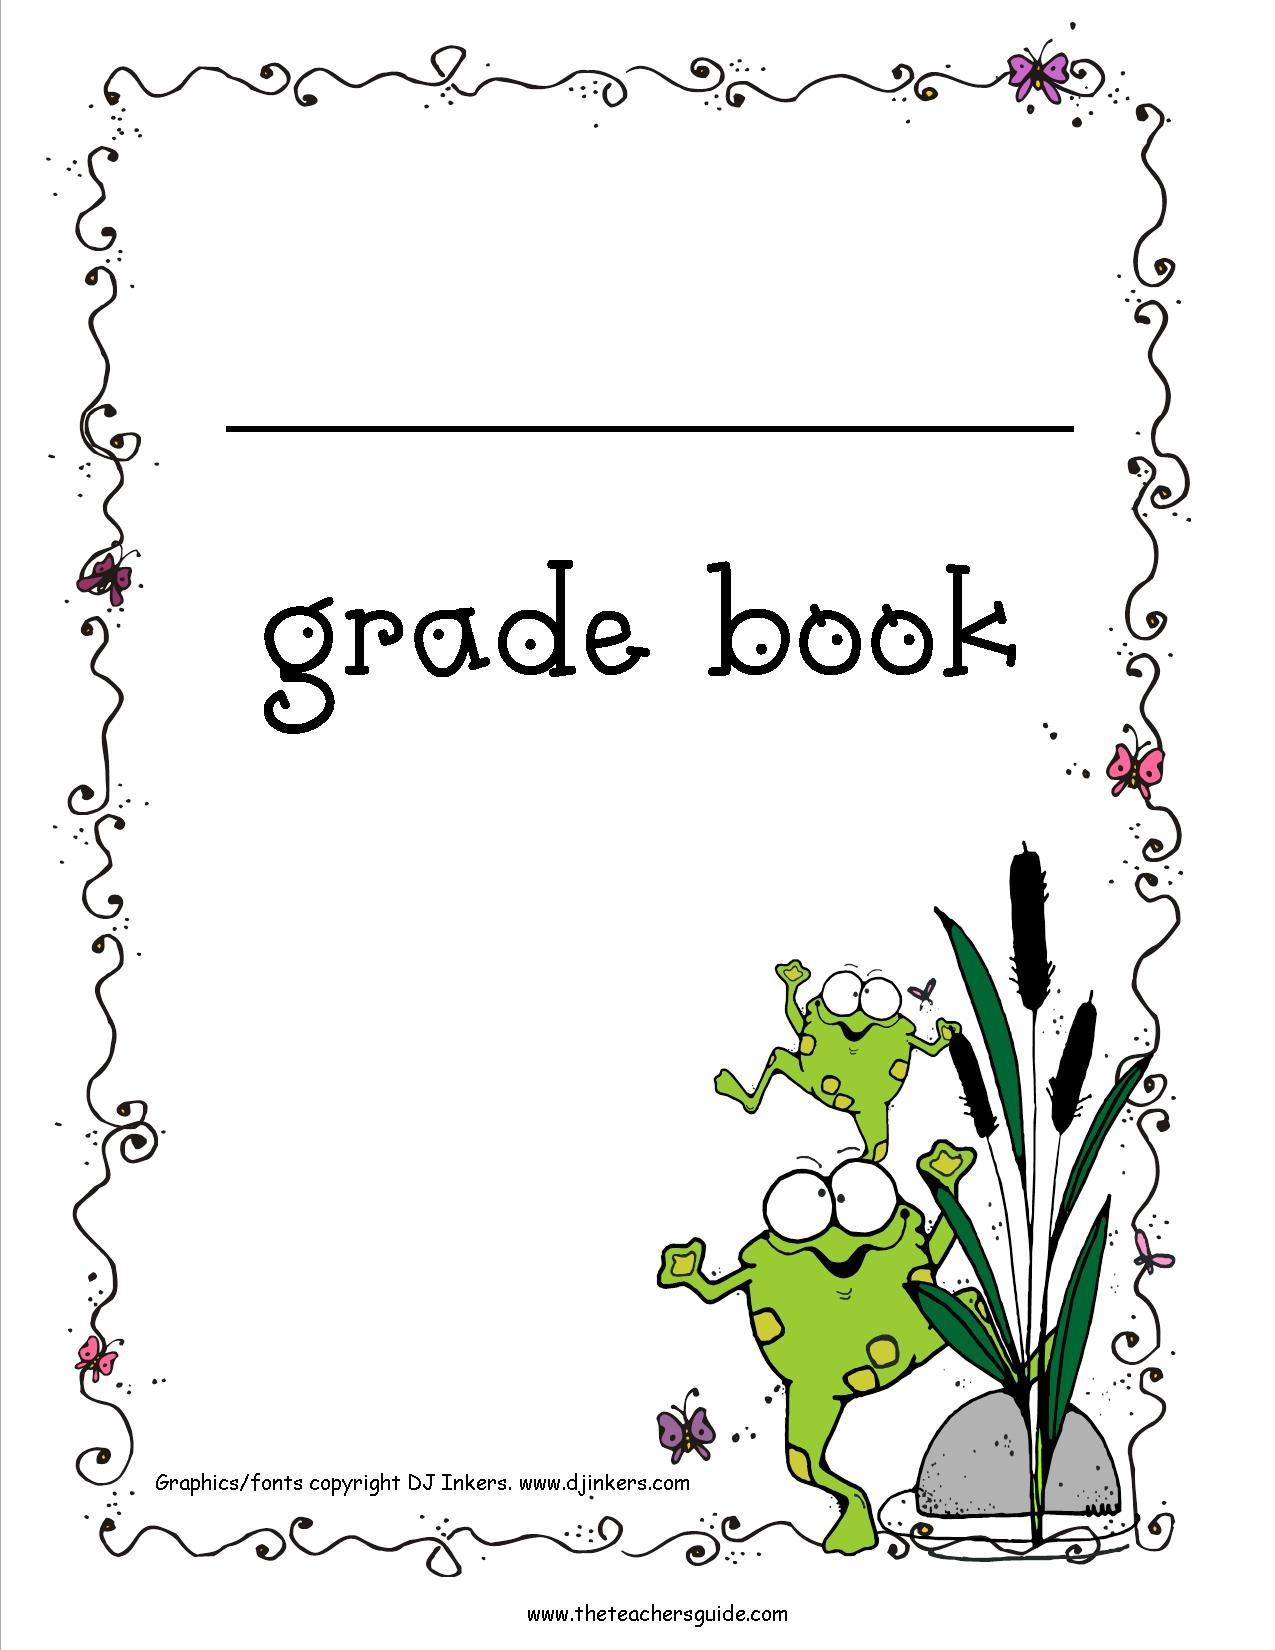 Free Printable Grade Books - Free Printable Gradebook Sheets For Teachers